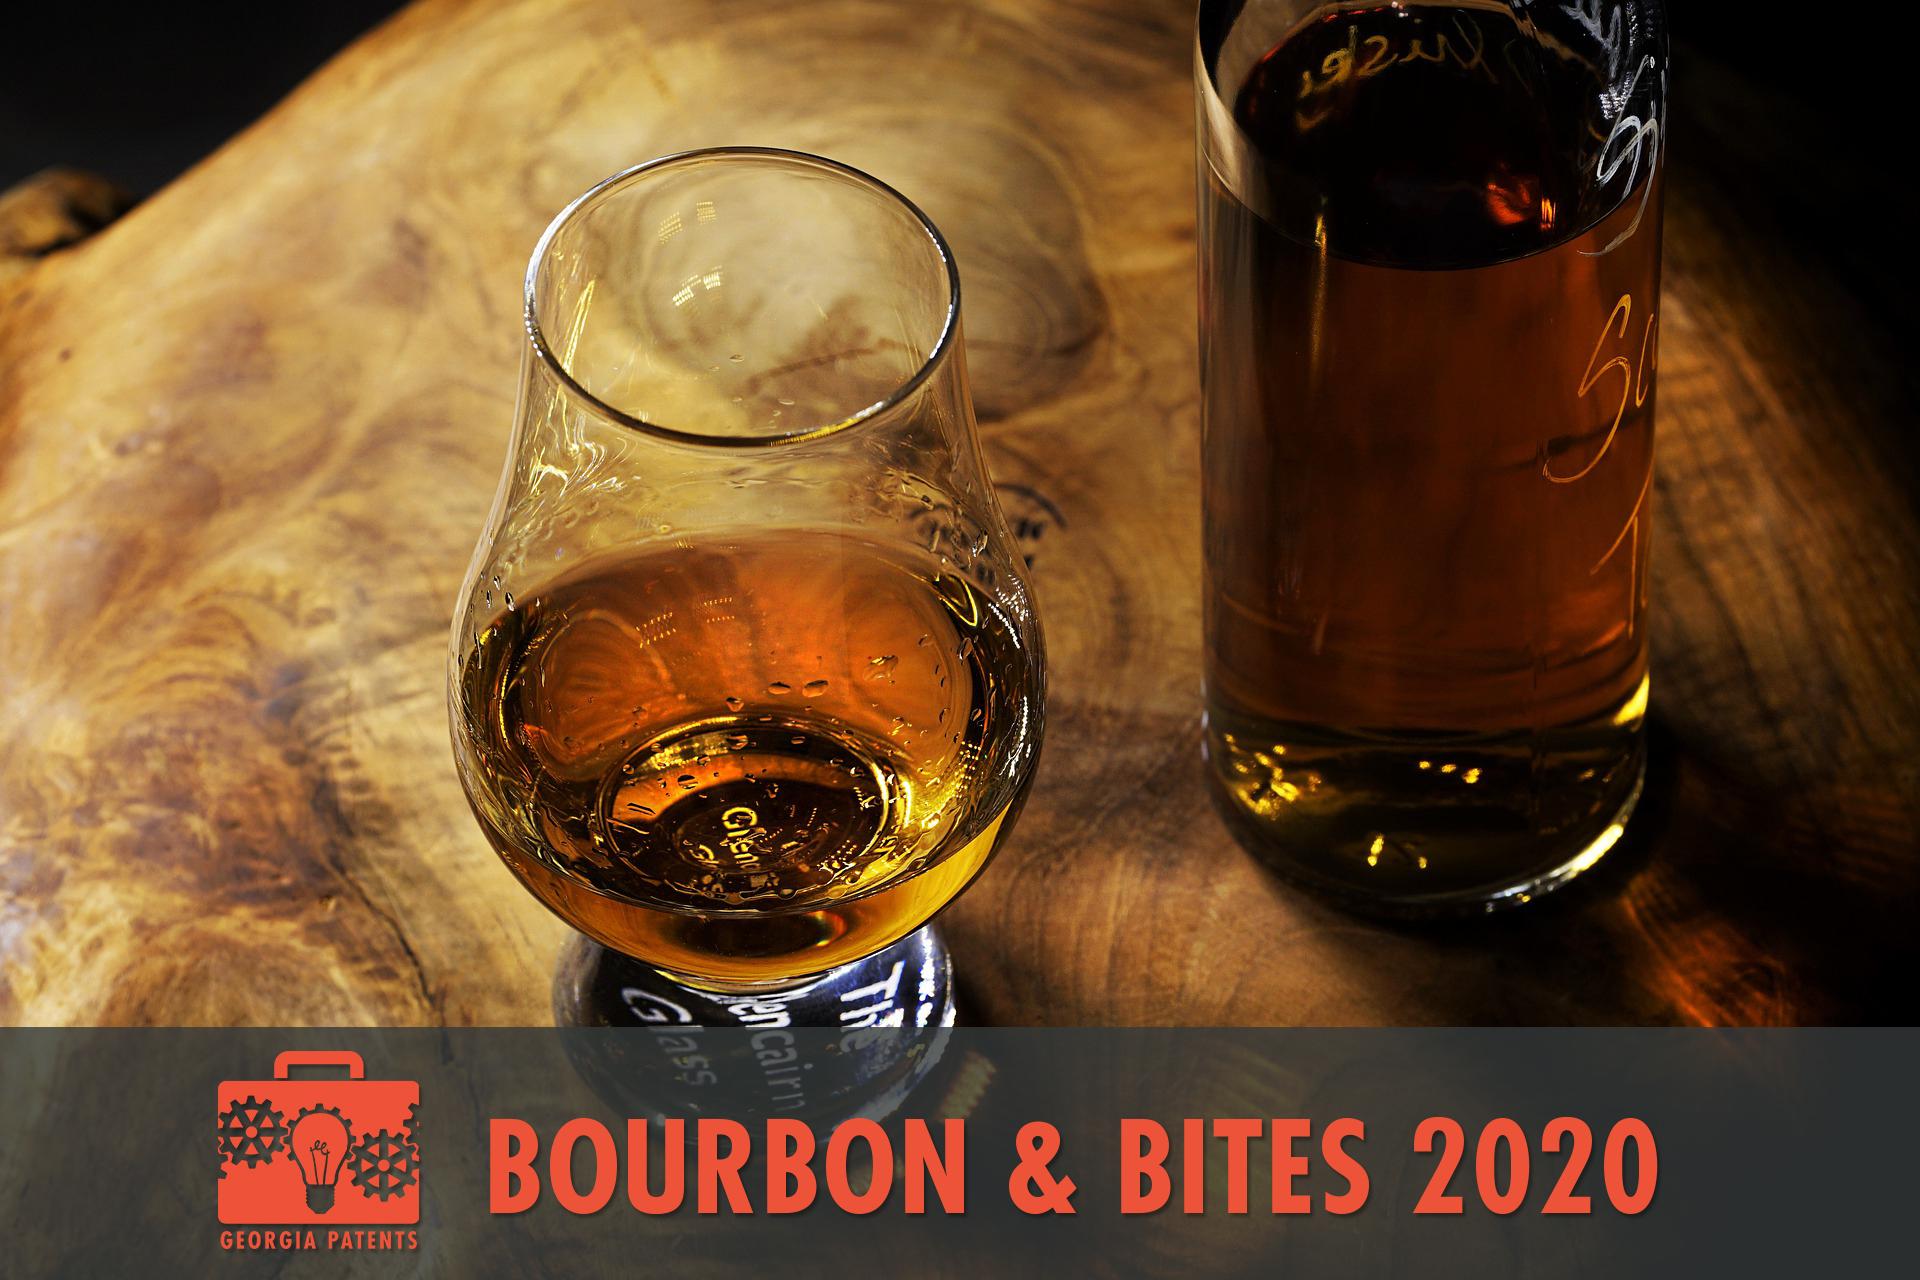 Bourbon & Bites